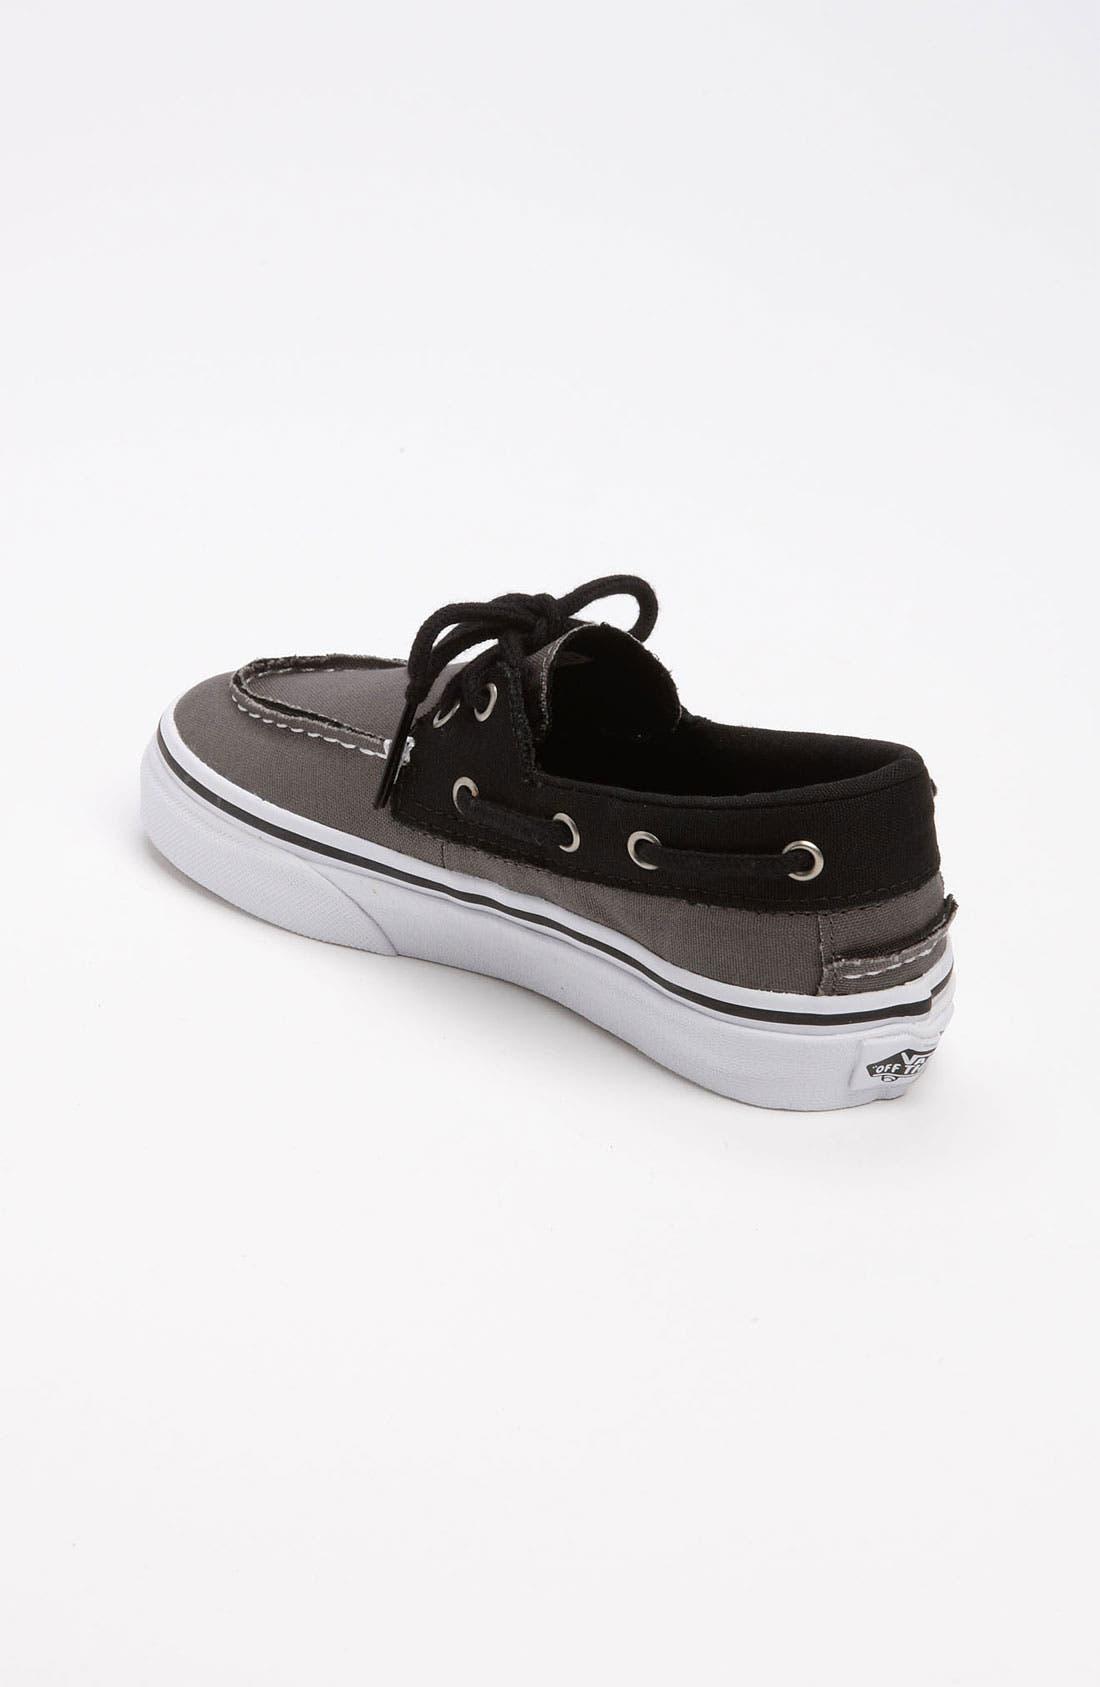 Alternate Image 2  - Vans 'Zapato del Barco' Boat Shoe (Baby, Walker, Toddler, Little Kid & Big Kid)